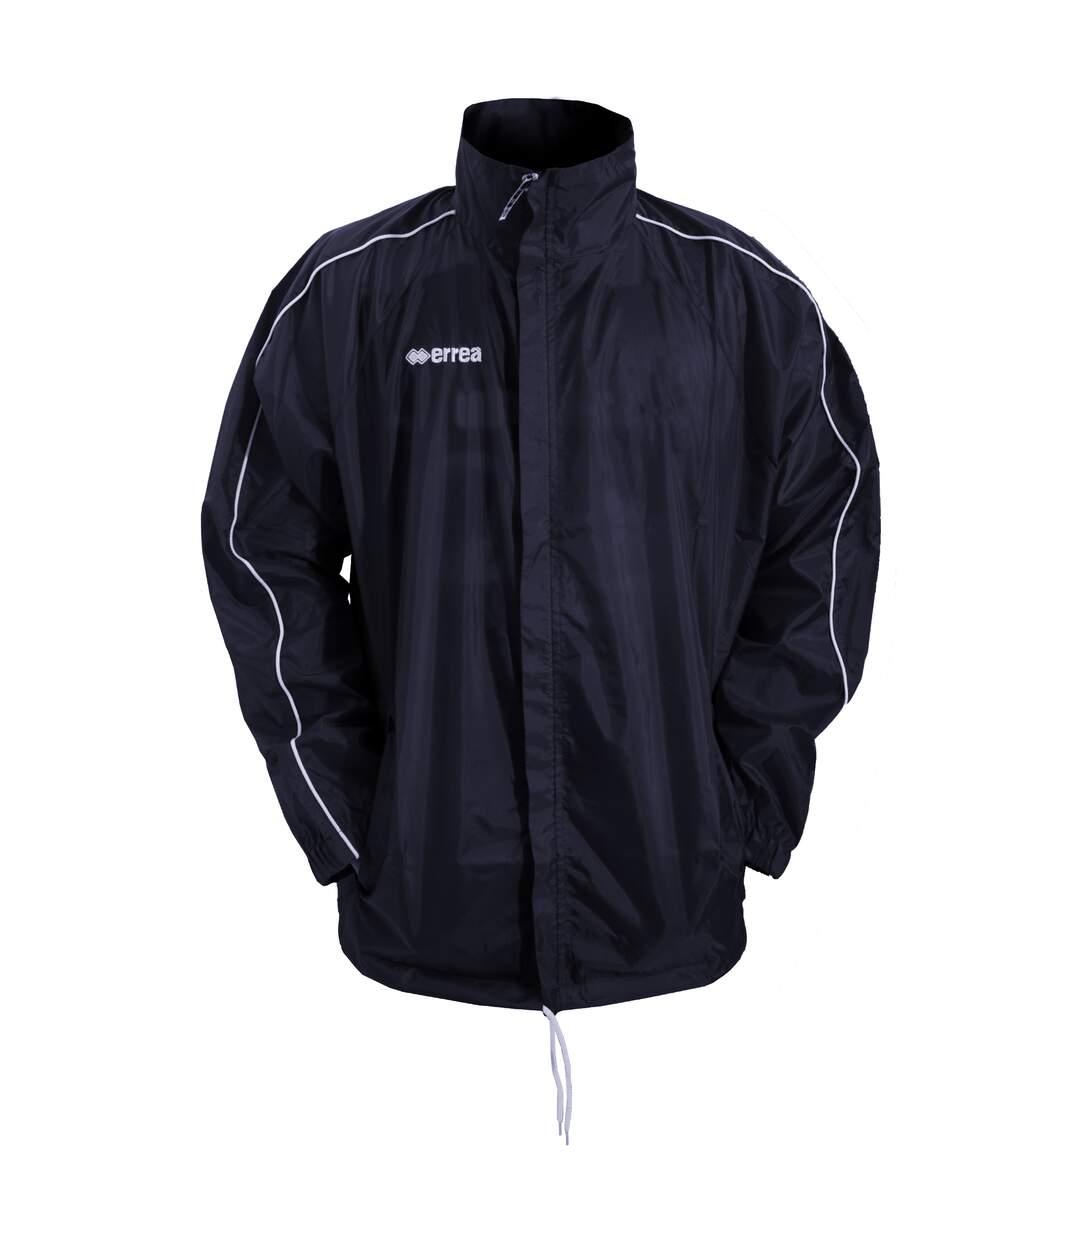 Errea Mens Basic Training Football Sport Jacket (Blue) - UTPC259